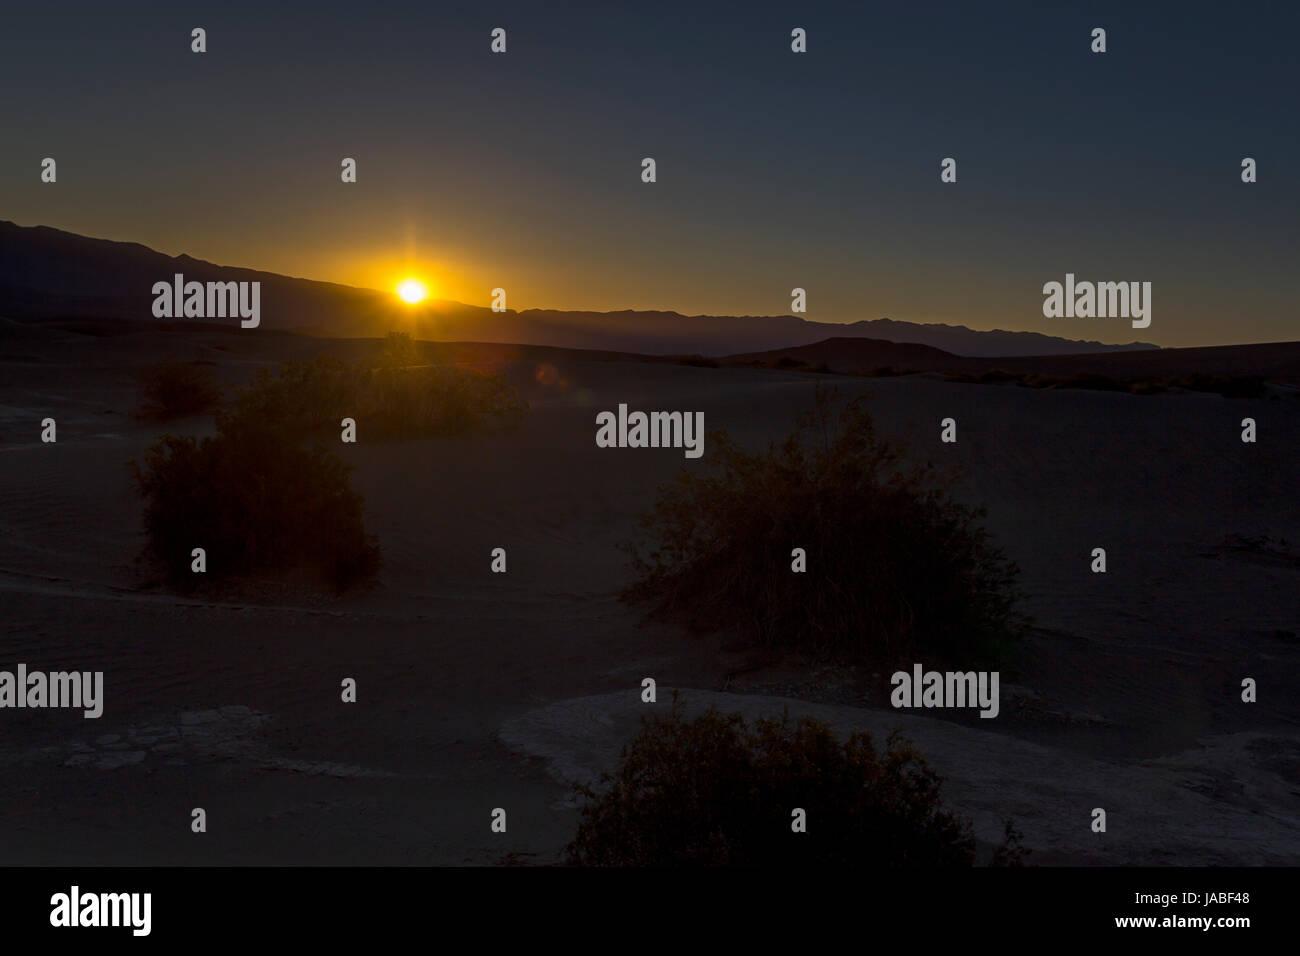 sunrise, Mesquite Flat Sand Dunes, Death Valley National Park, Death Valley, California - Stock Image